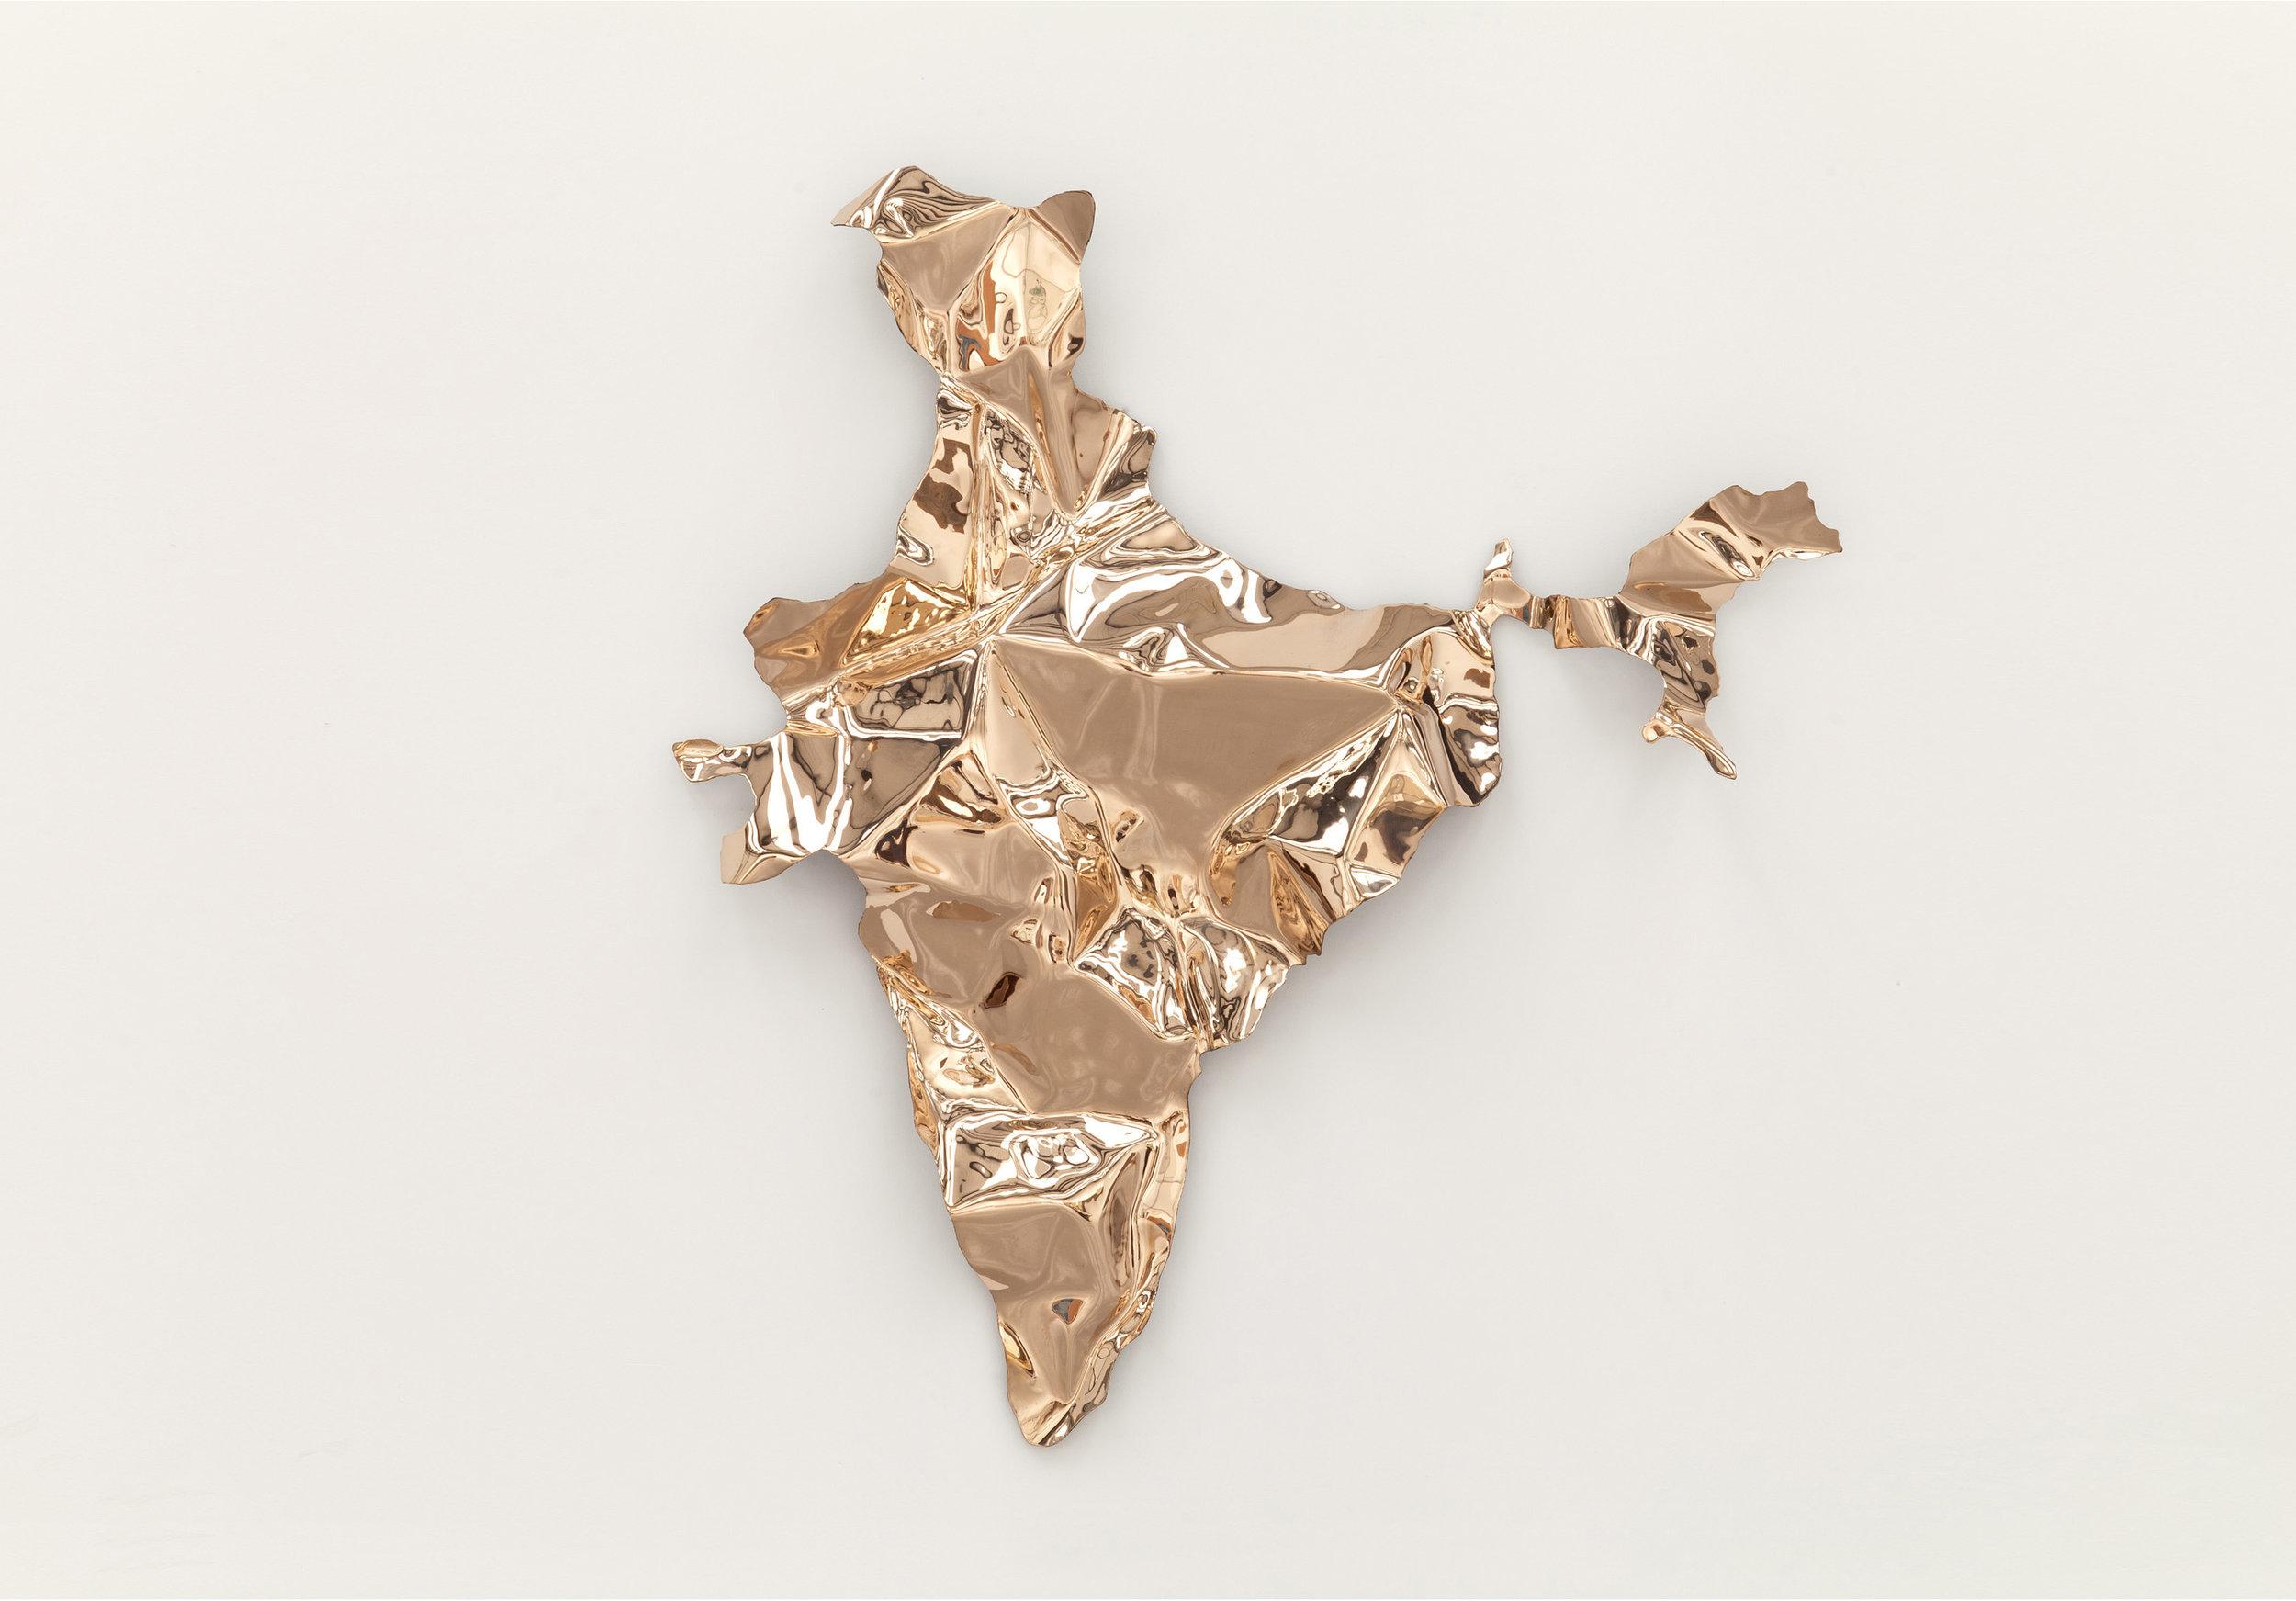 bu_00001_If I had known_INDIA_bronze_A.jpg